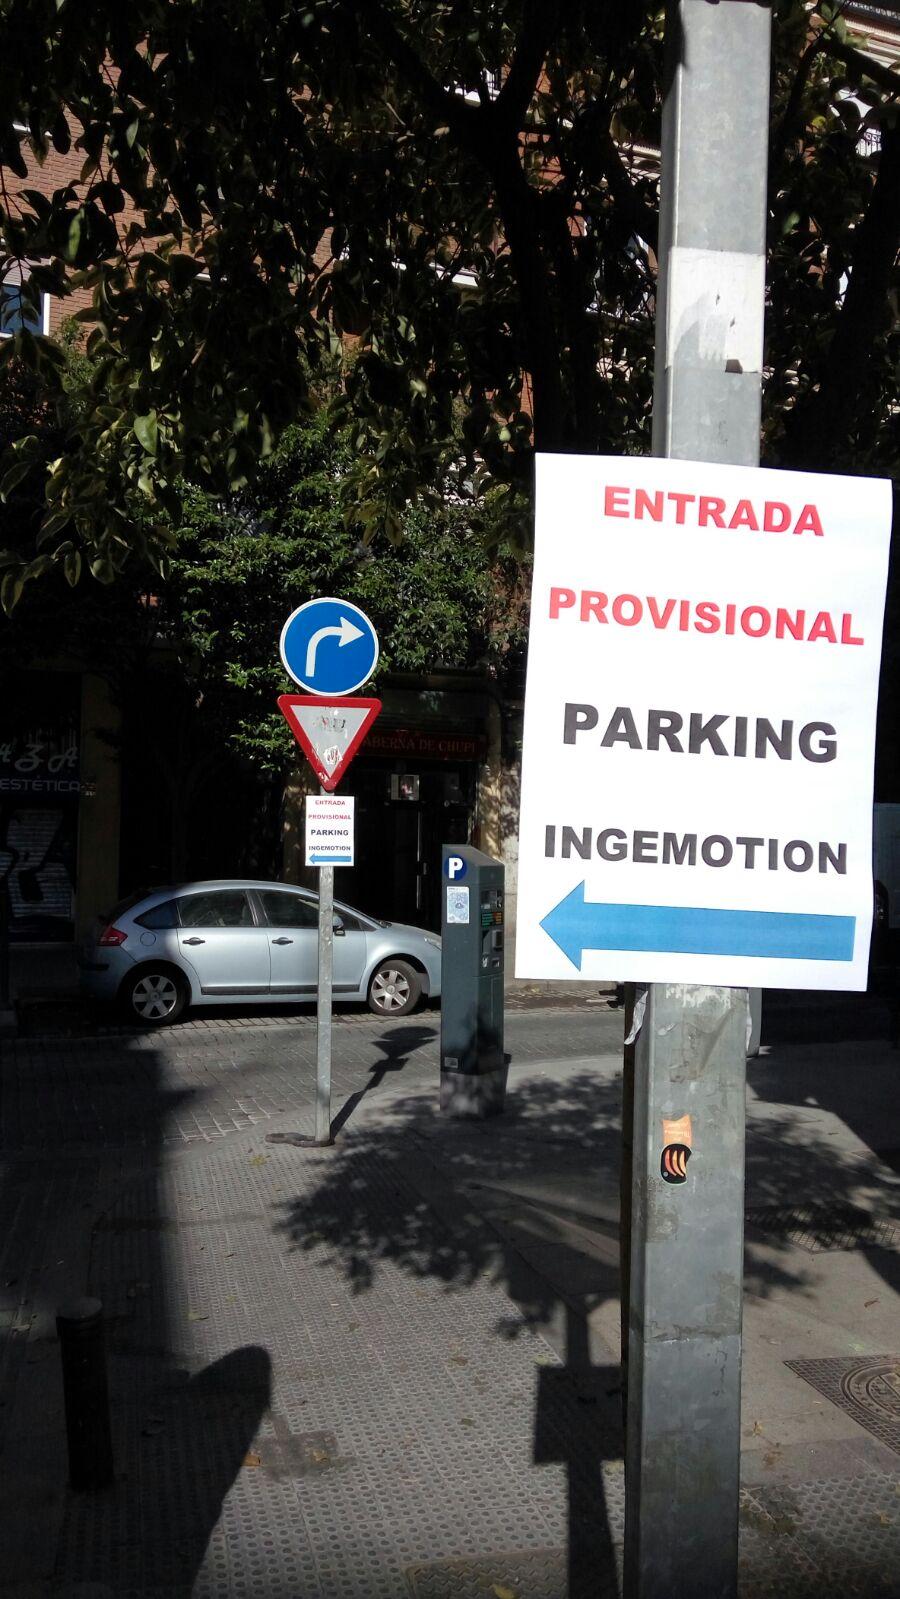 Noticias ingemotion s l for Catalogo lidl leon